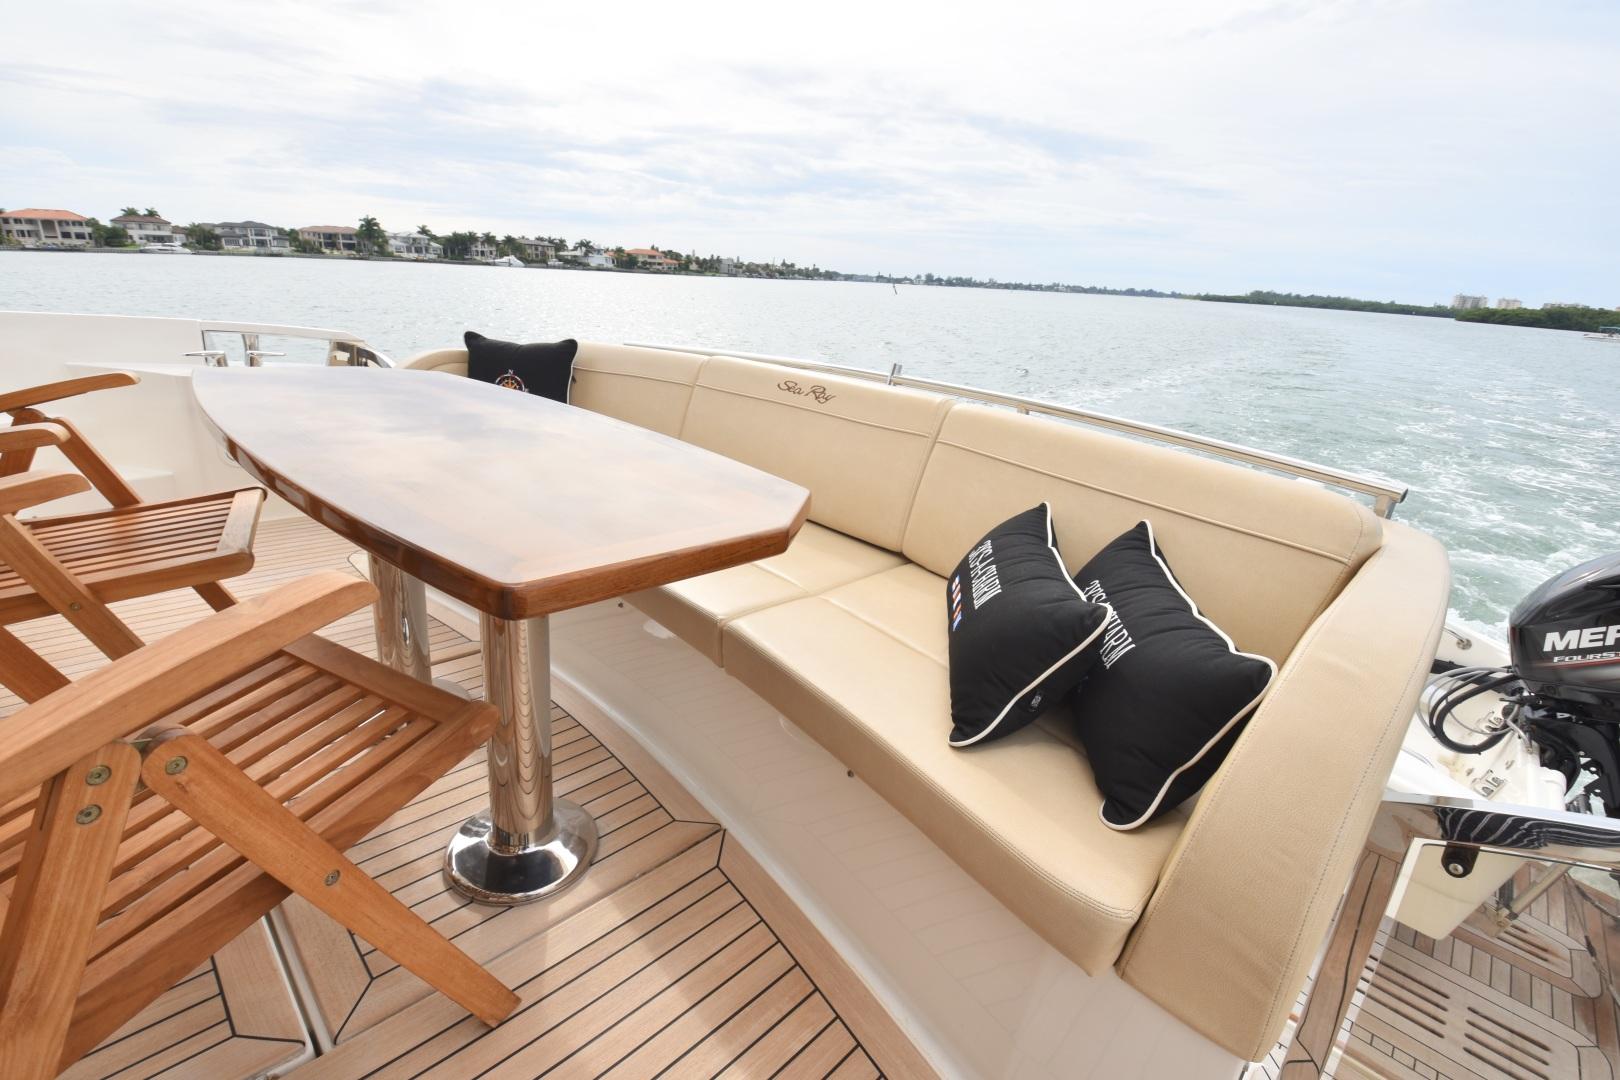 Sea Ray-L650 2016-3x's the Charm Longboat Key-Florida-United States-2016 Sea Ray L650  3x's the Charm  Aft Cockpit-1251838 | Thumbnail